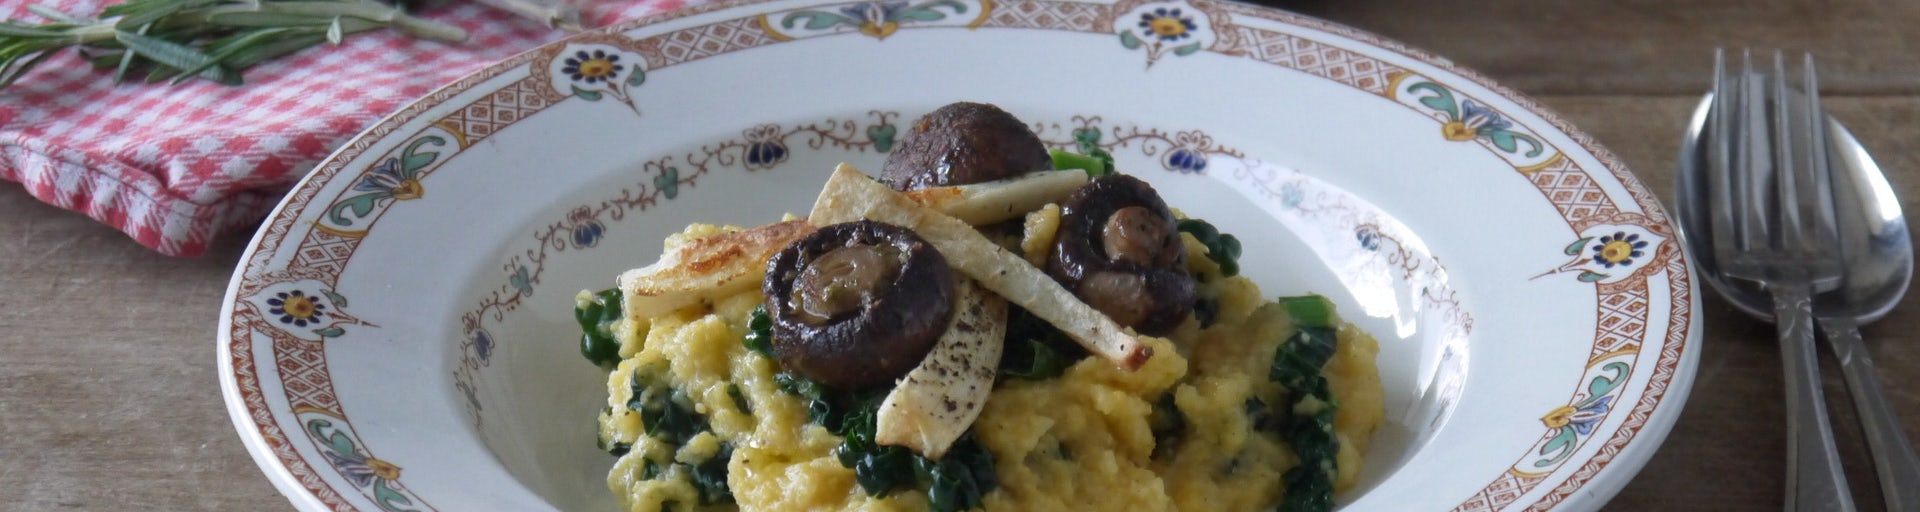 Wk 49 polenta da bomb champignons pastinaakfriet FP